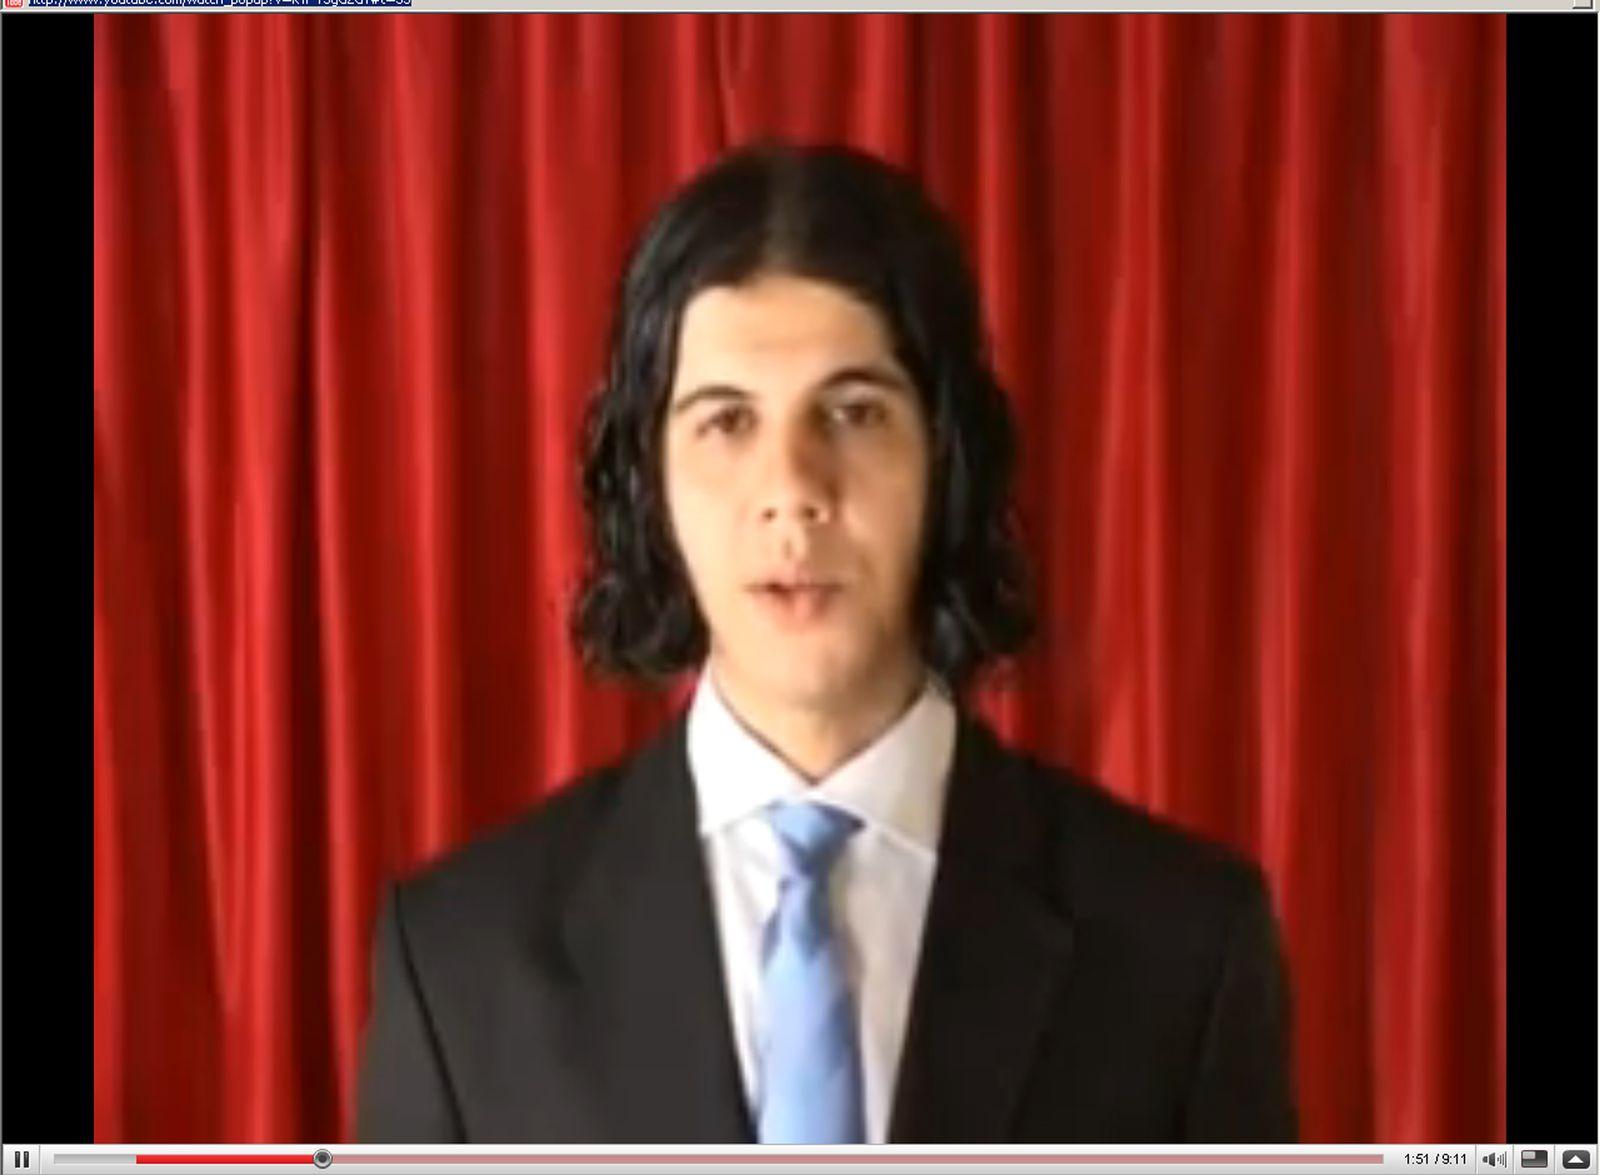 Yassin / Jahrzehnt / Islamist Harrach / Droh-Video